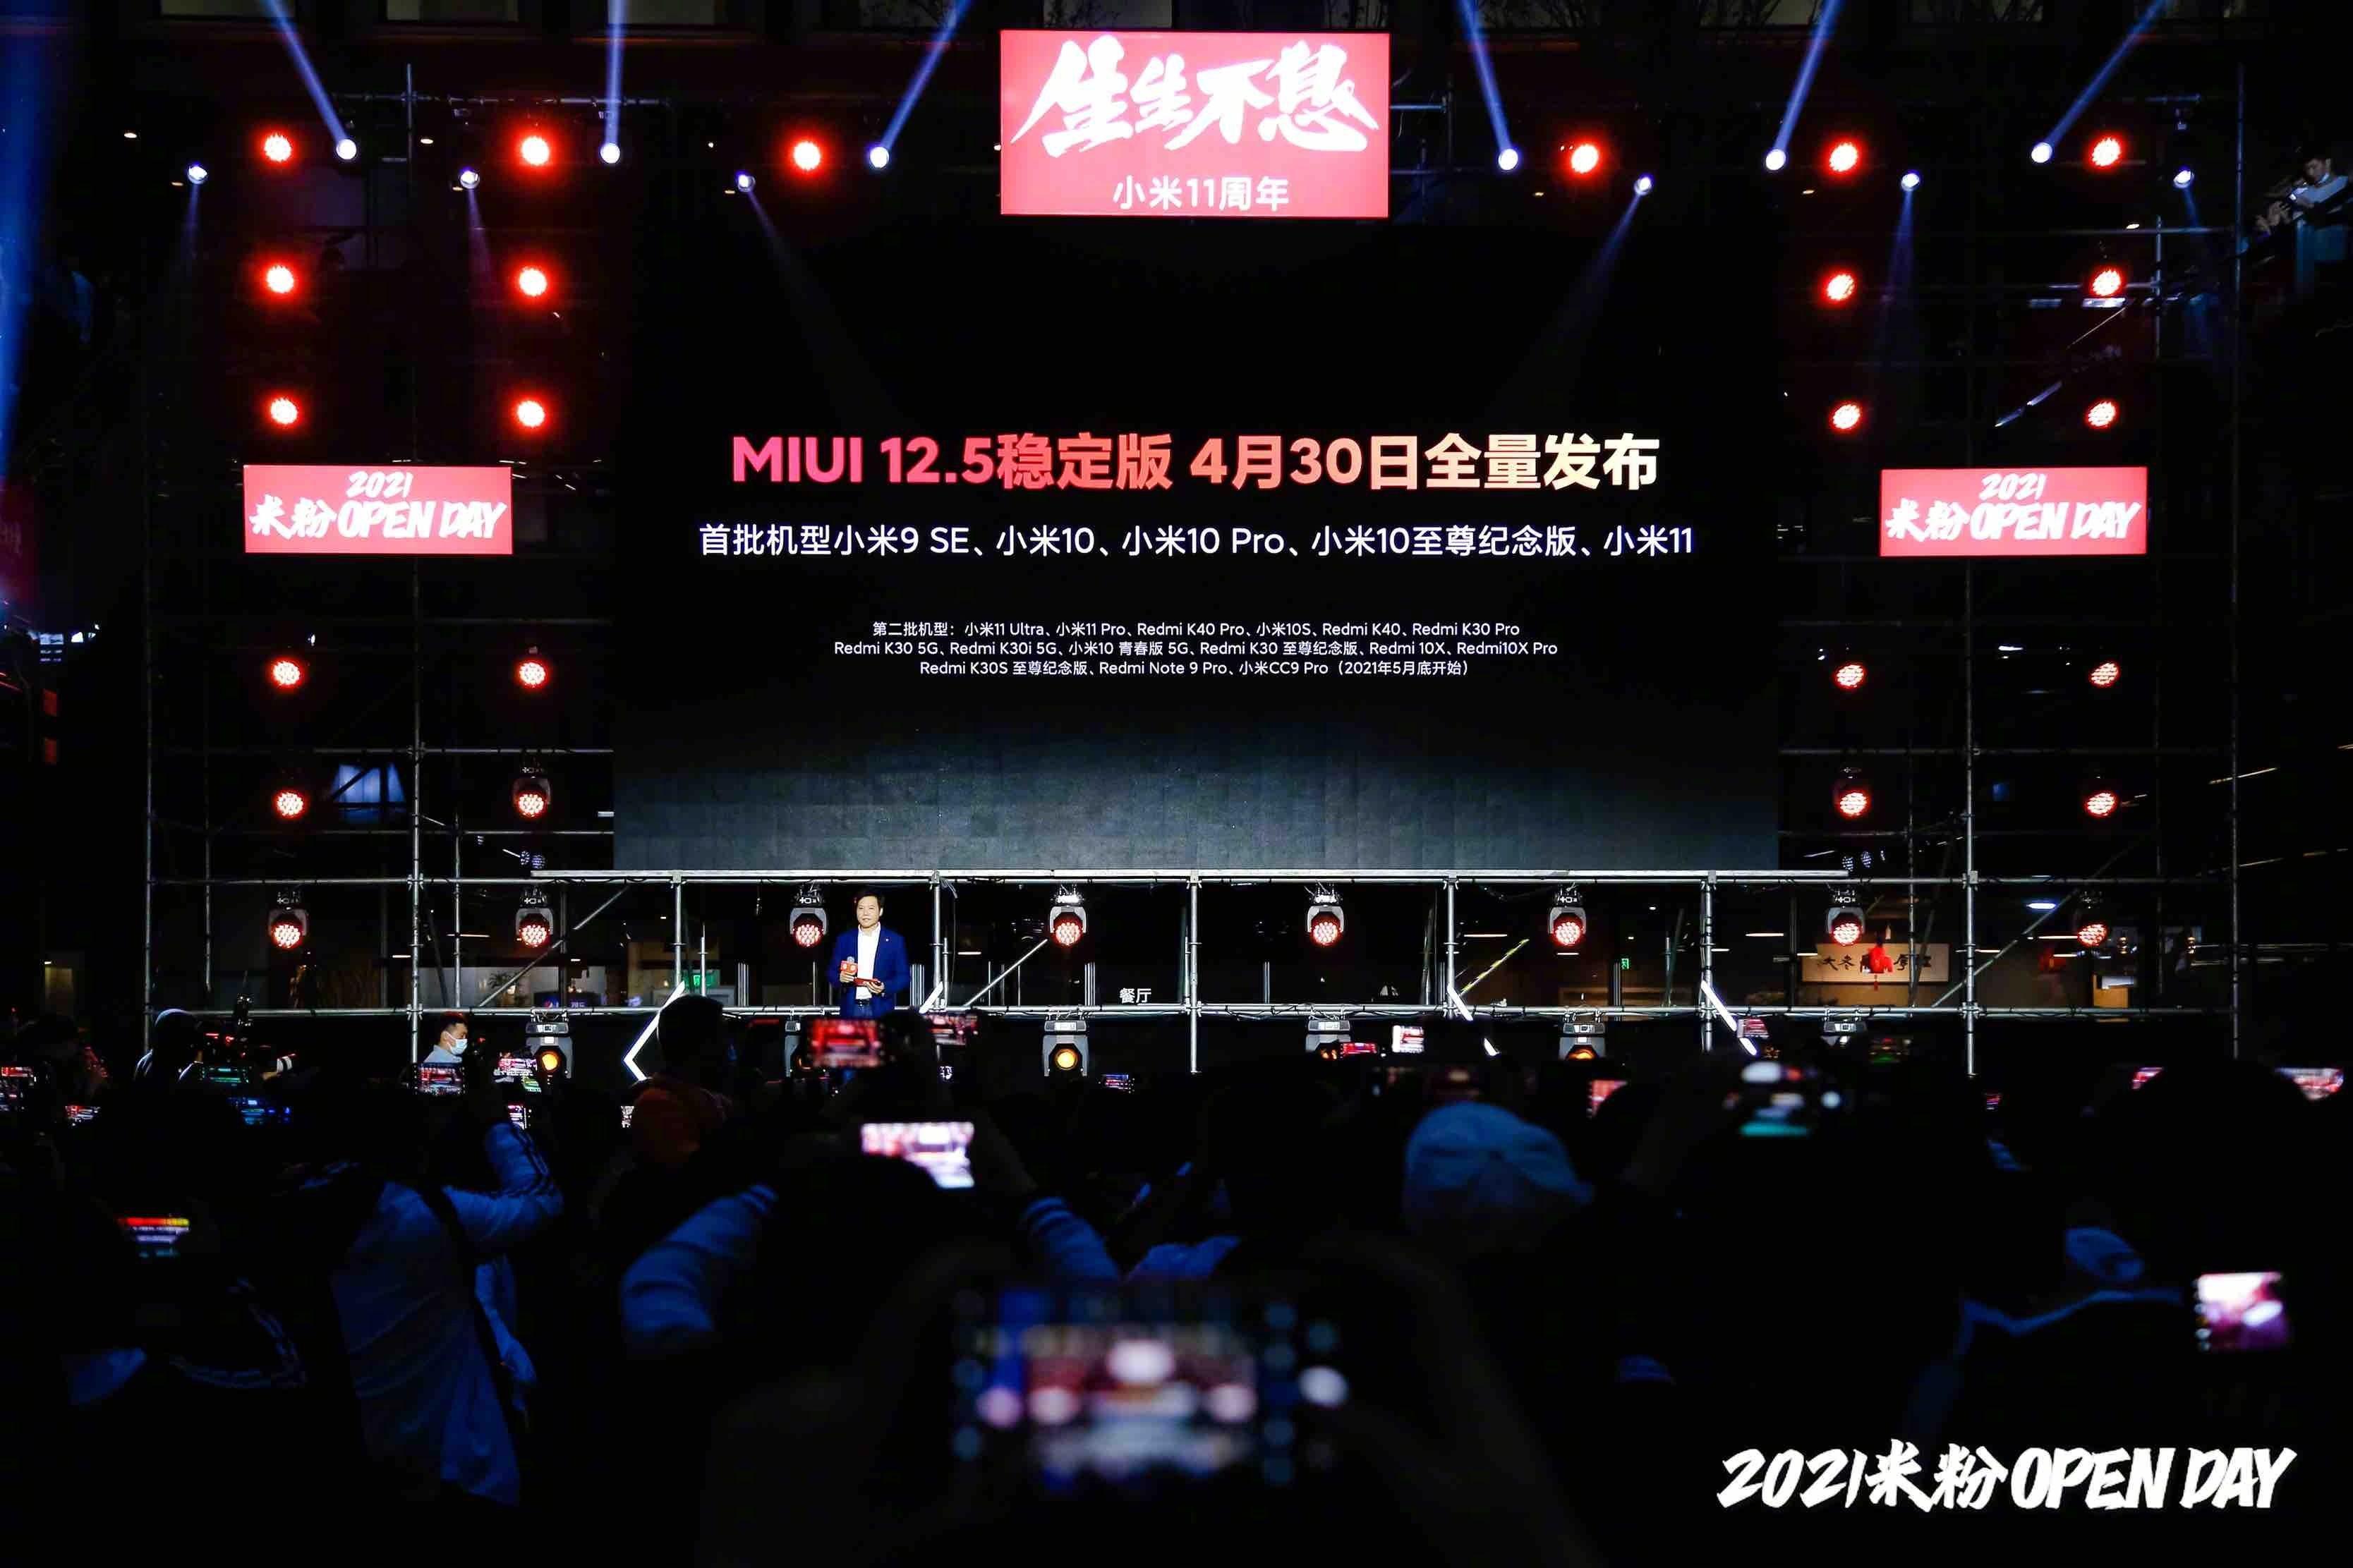 MIUI 12.5の安定版は4月30日に配信開始、Xiaomi Mi 11やXiaomi Mi 10 Ultraなど5機種が最初に配信